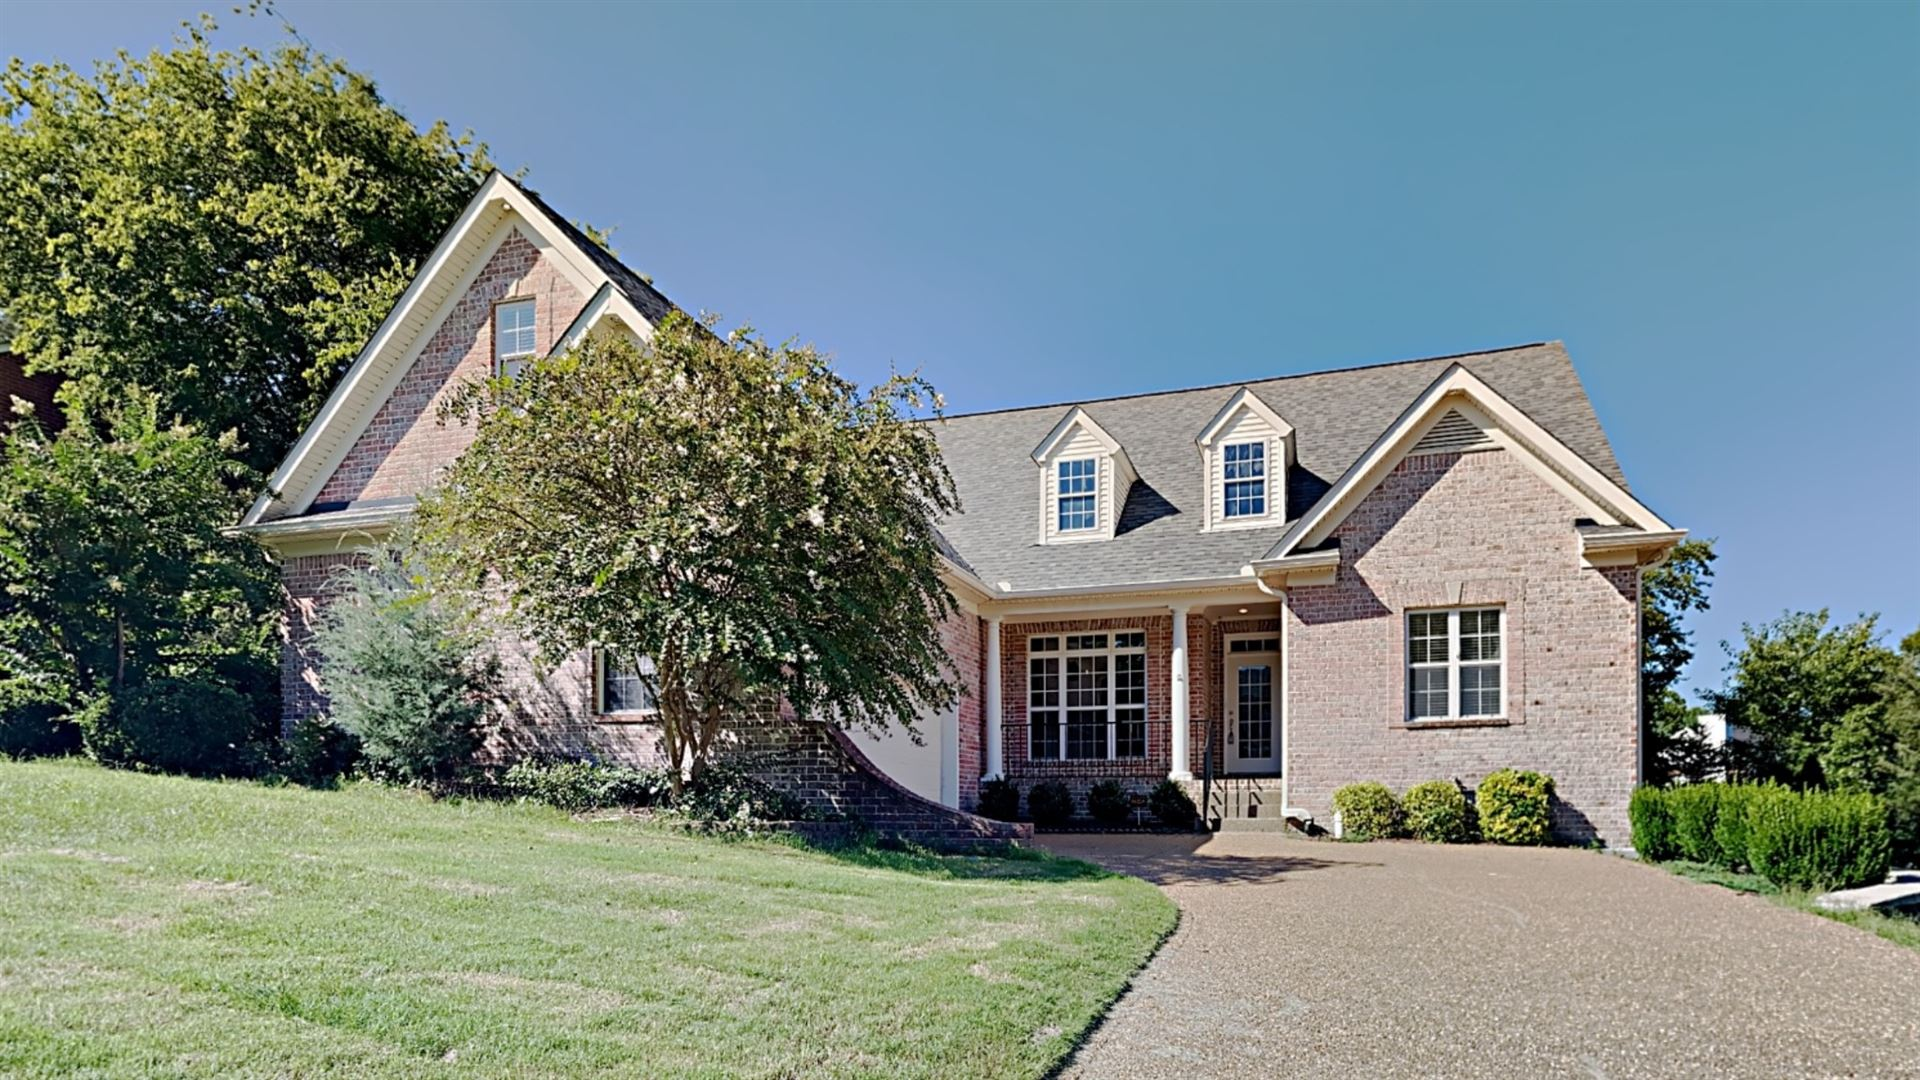 Photo of 1588 Red Oak Ln, Brentwood, TN 37027 (MLS # 2289052)